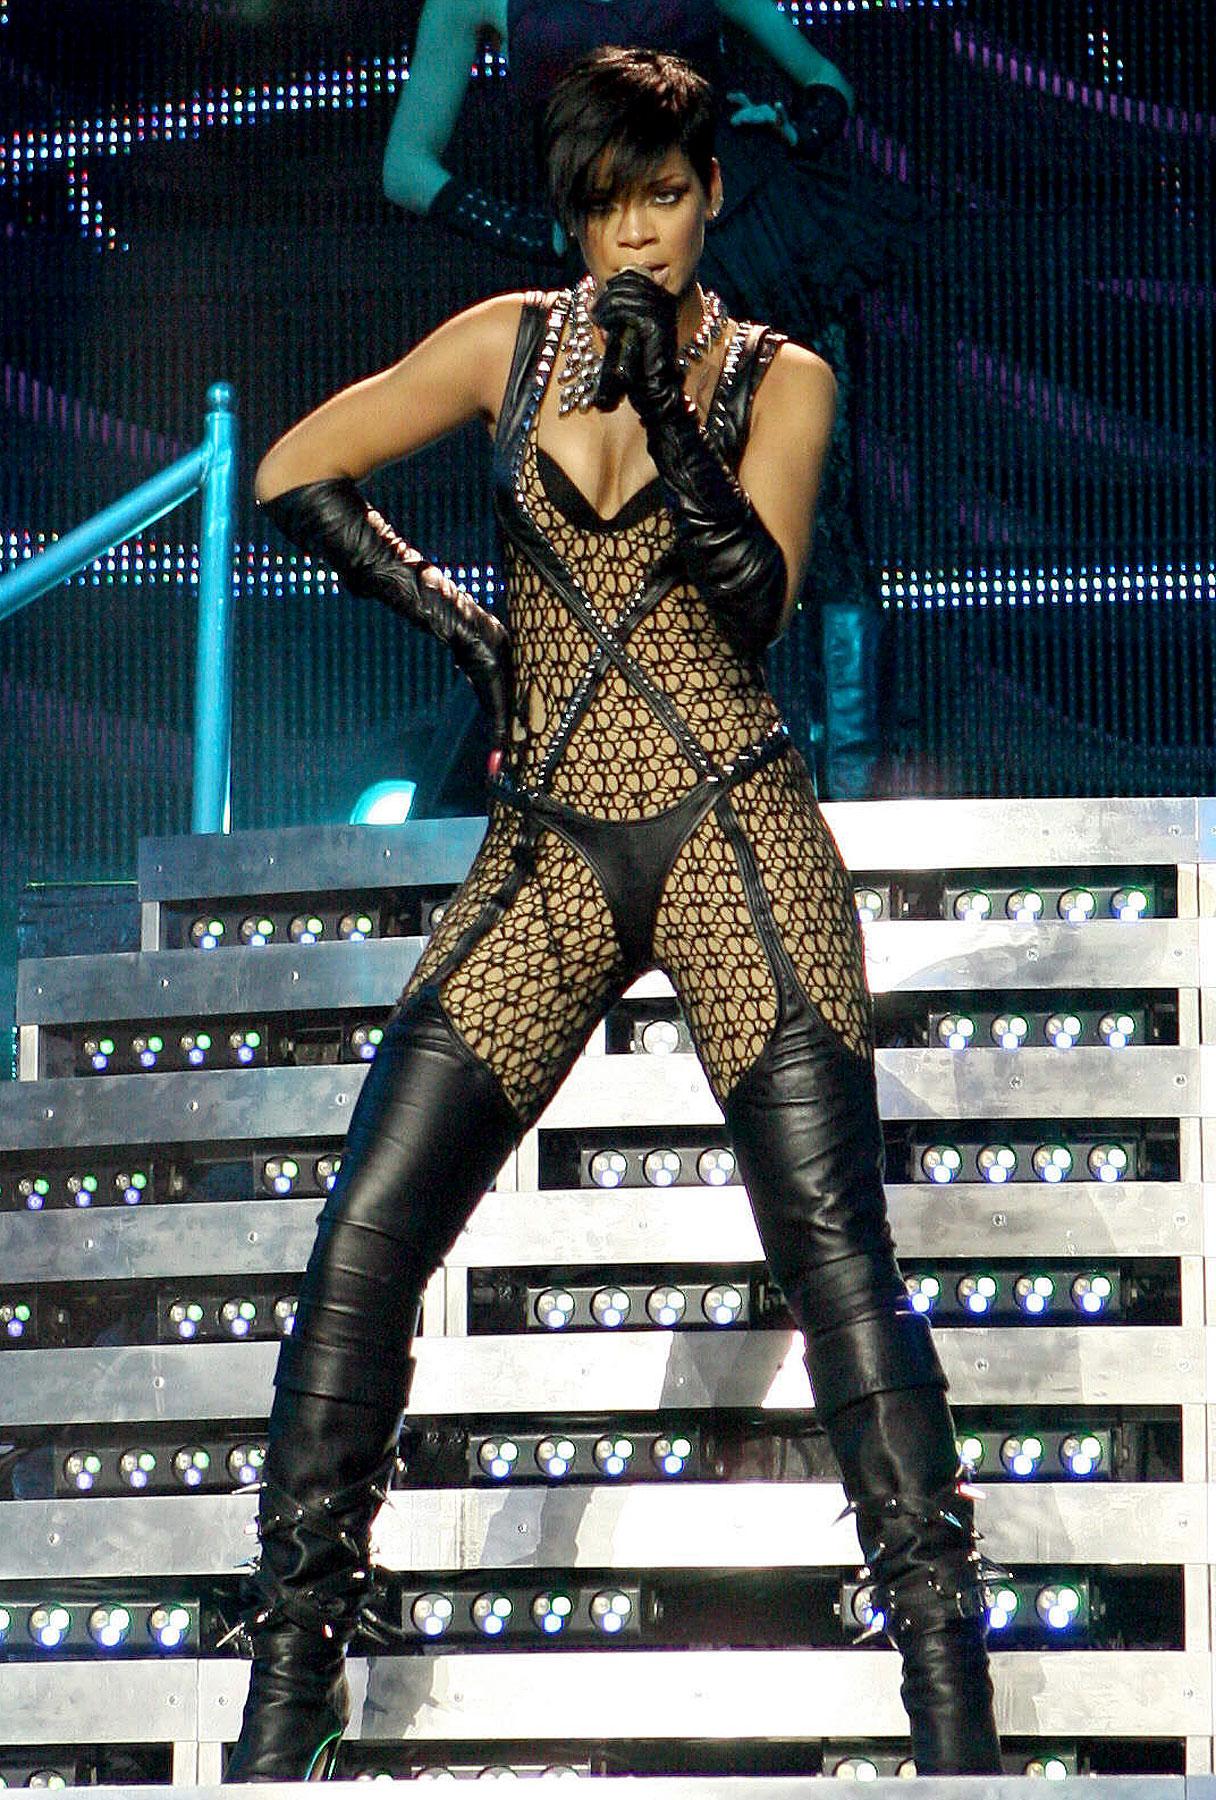 Rihanna Bails on Dubai Concert—for Chris Brown Court Date?